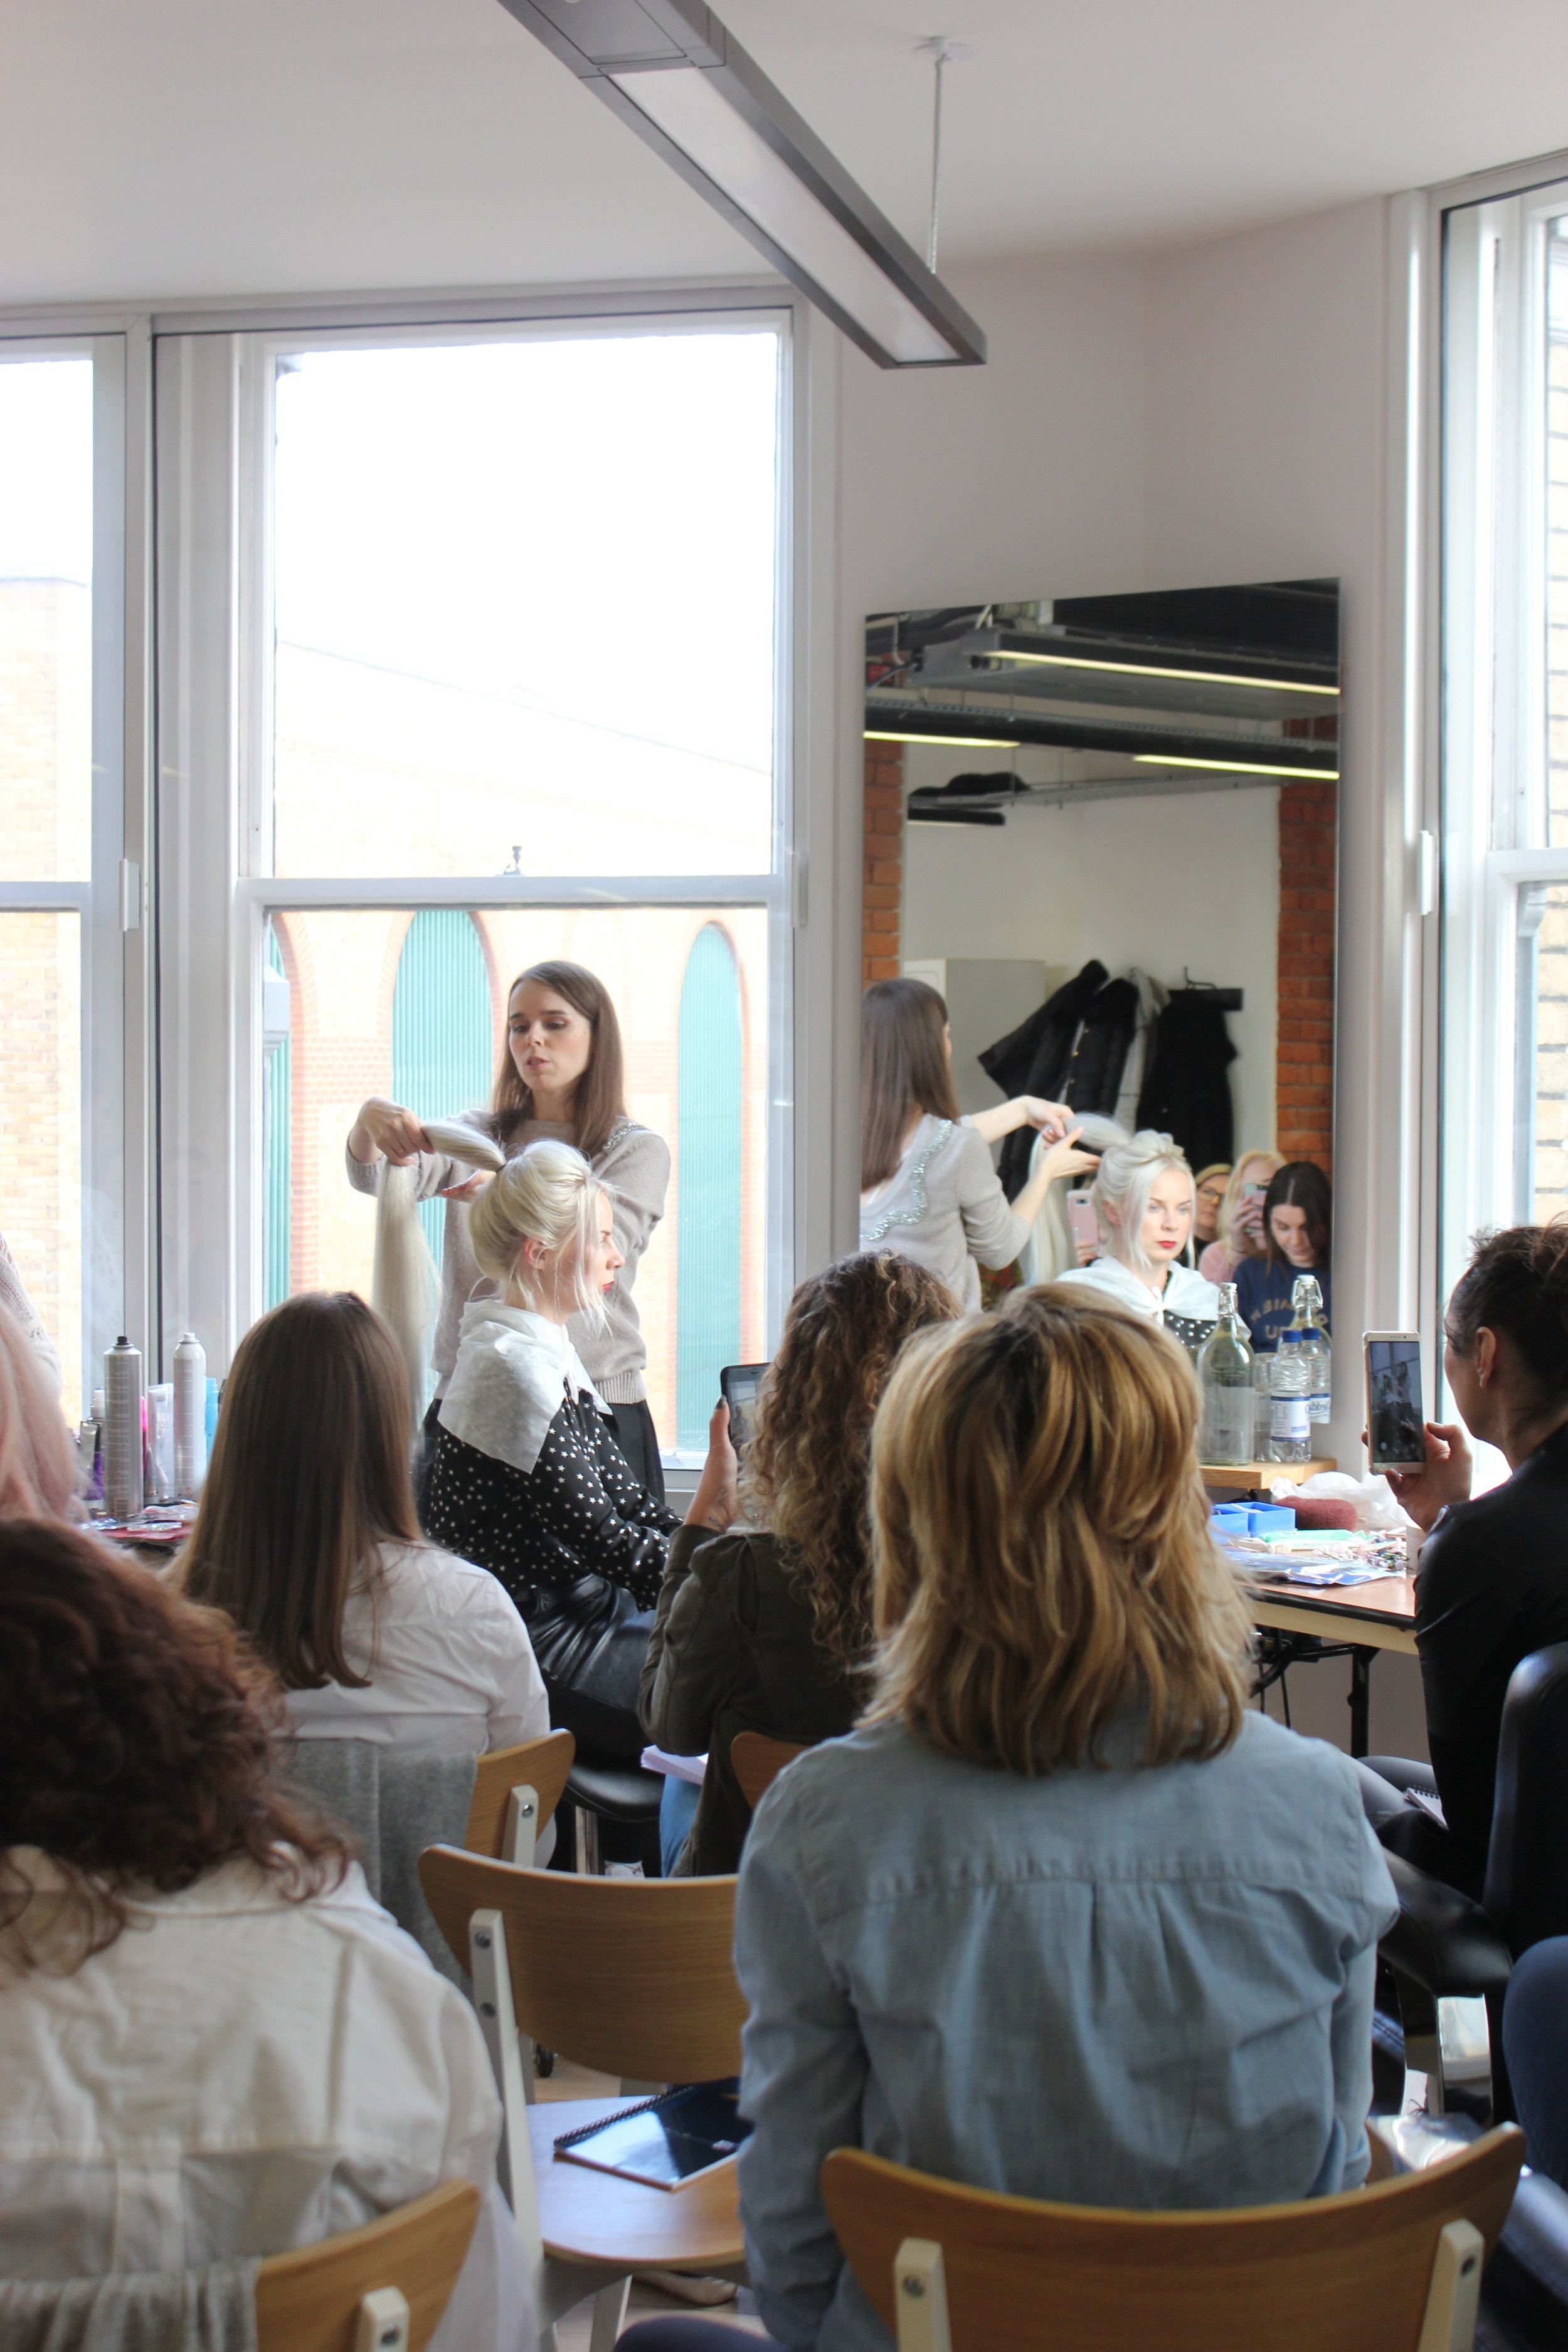 Kristina's hair masterclass with Lena Bogucharskaya at Hunter Collective.